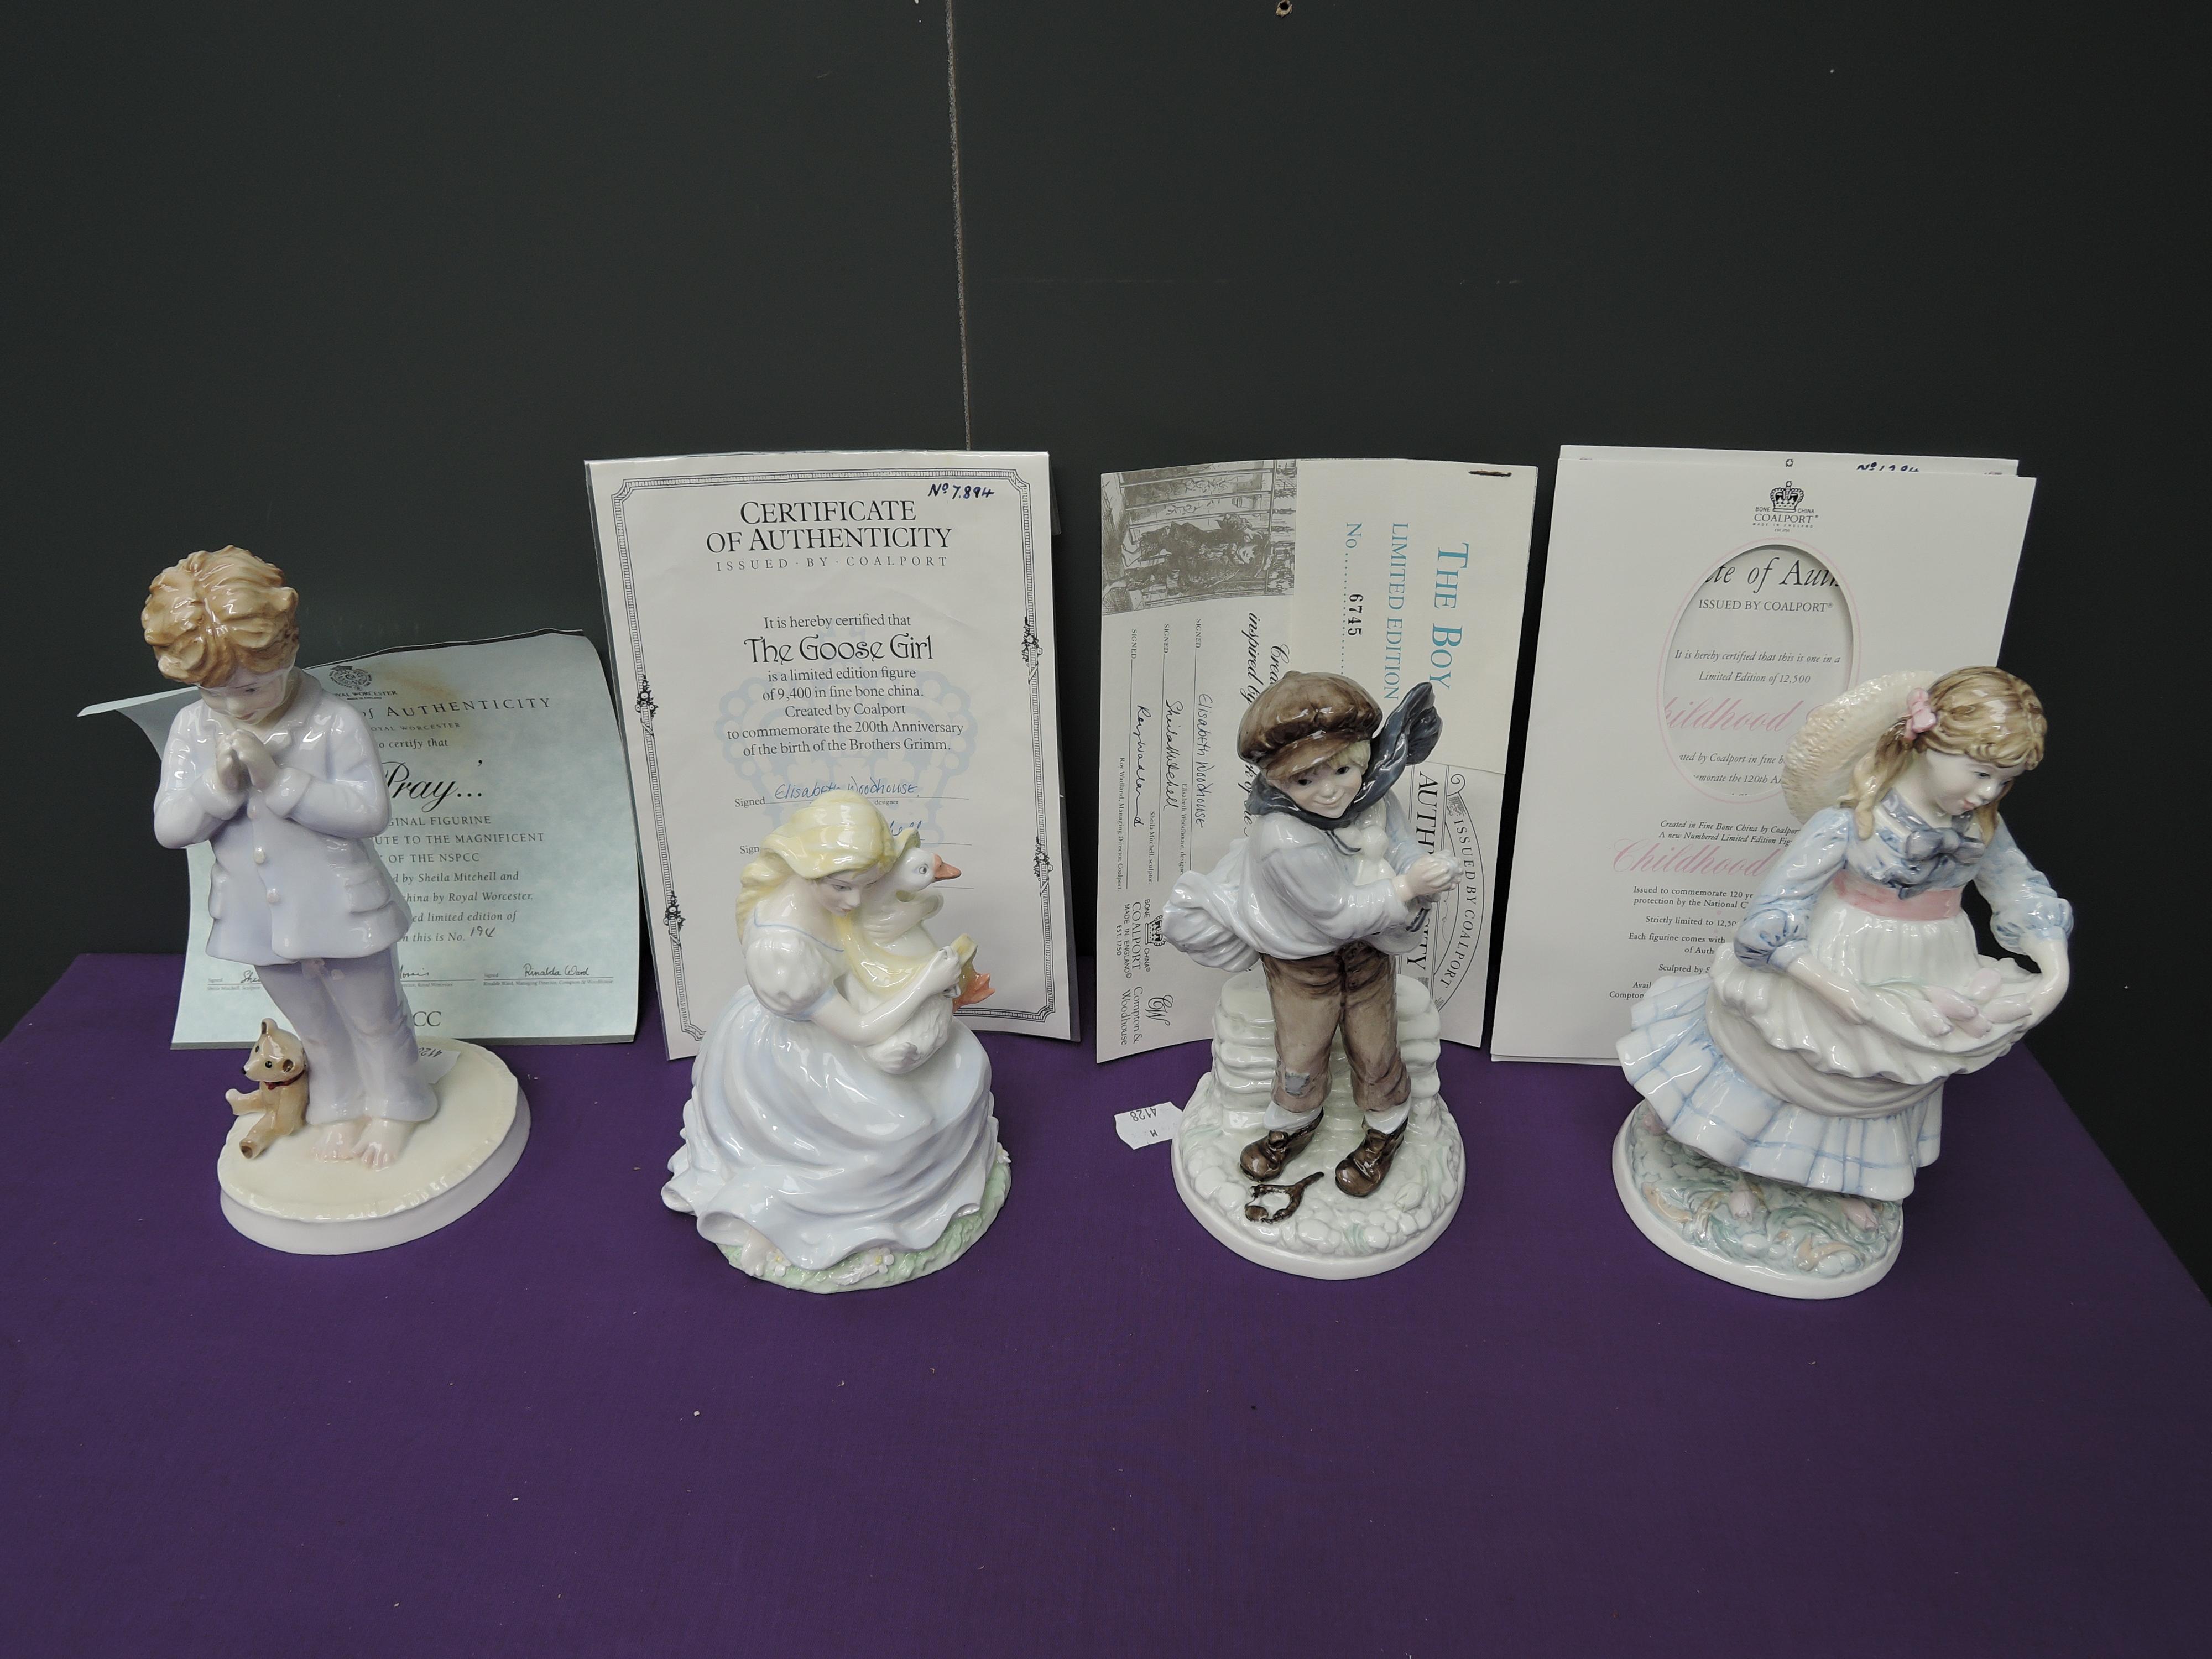 Four Coalport Compton & Woodhouse limited edition figurines, The Boy 6745/9500, Childhood Joys 1284